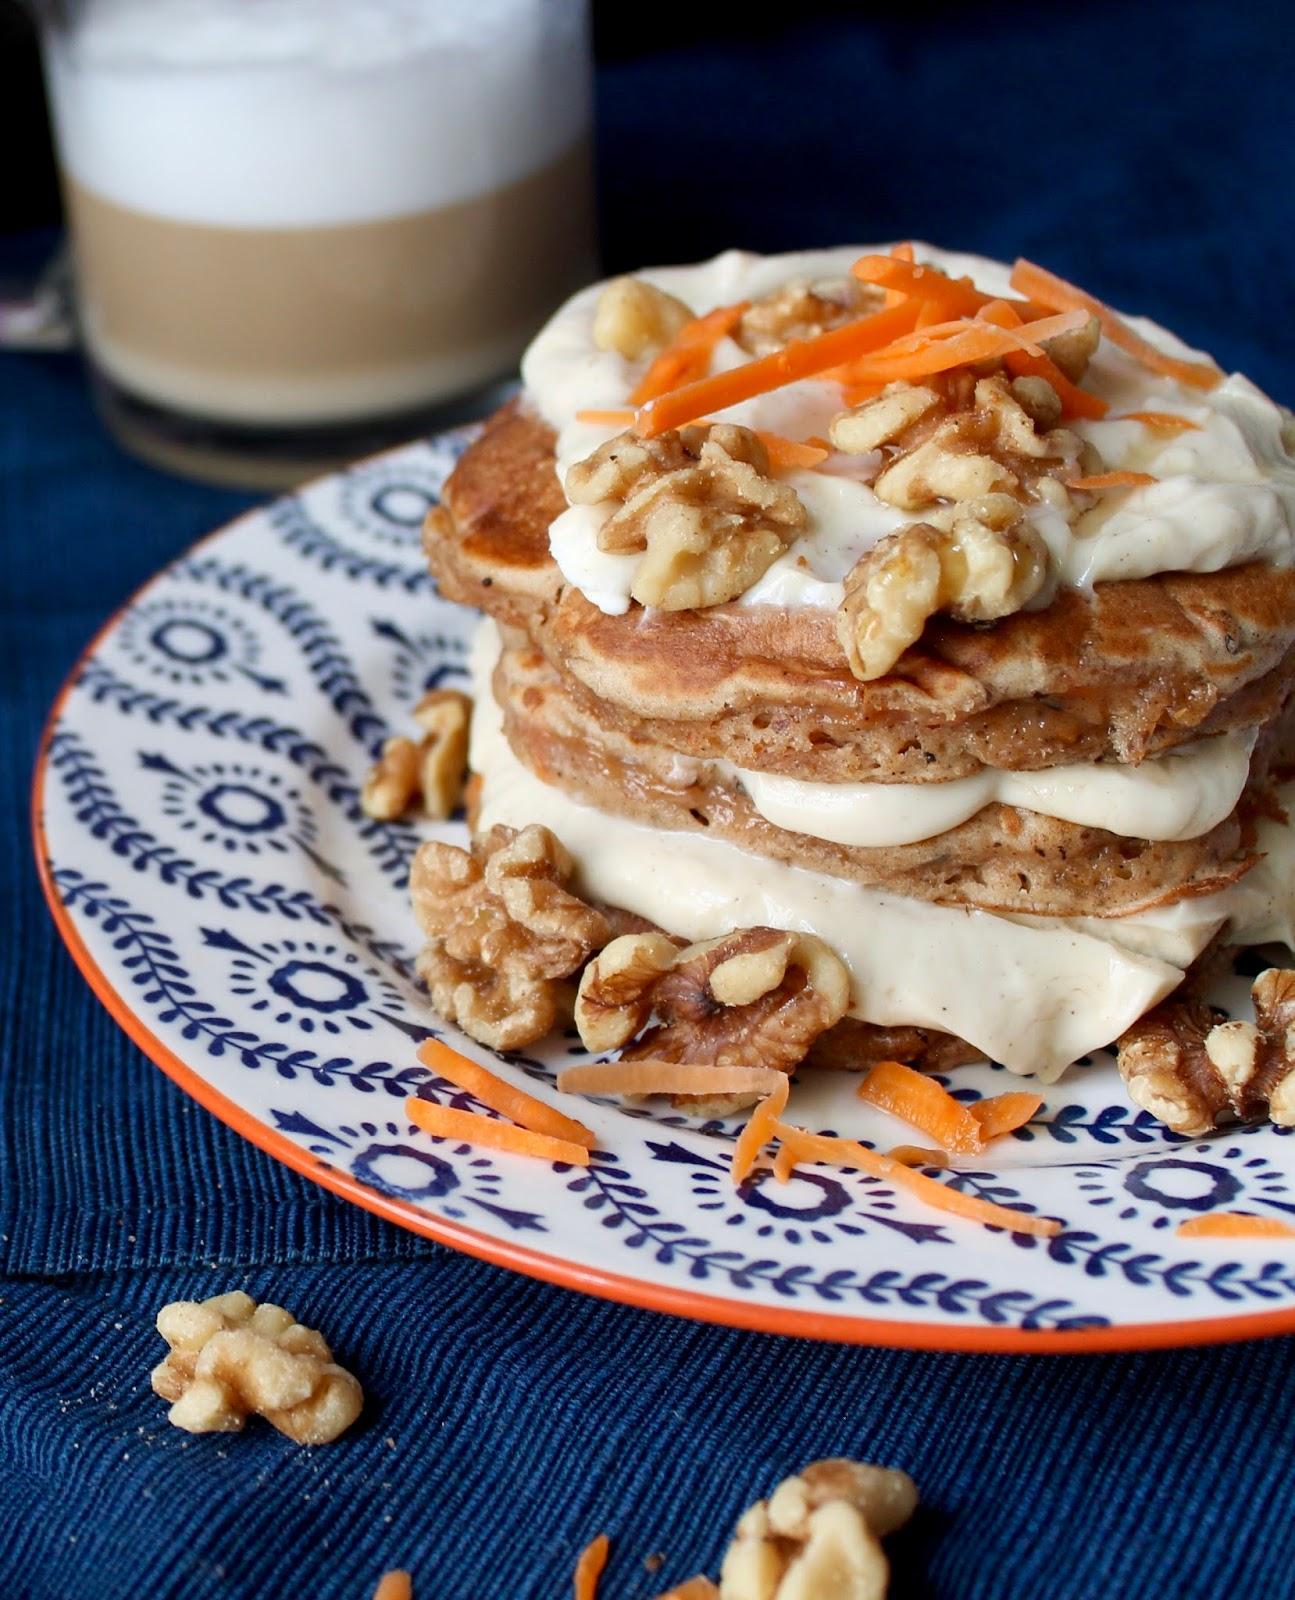 http://www.tfdiaries.com/2017/08/carrot-cake-pancakes-with-maple-cream.html